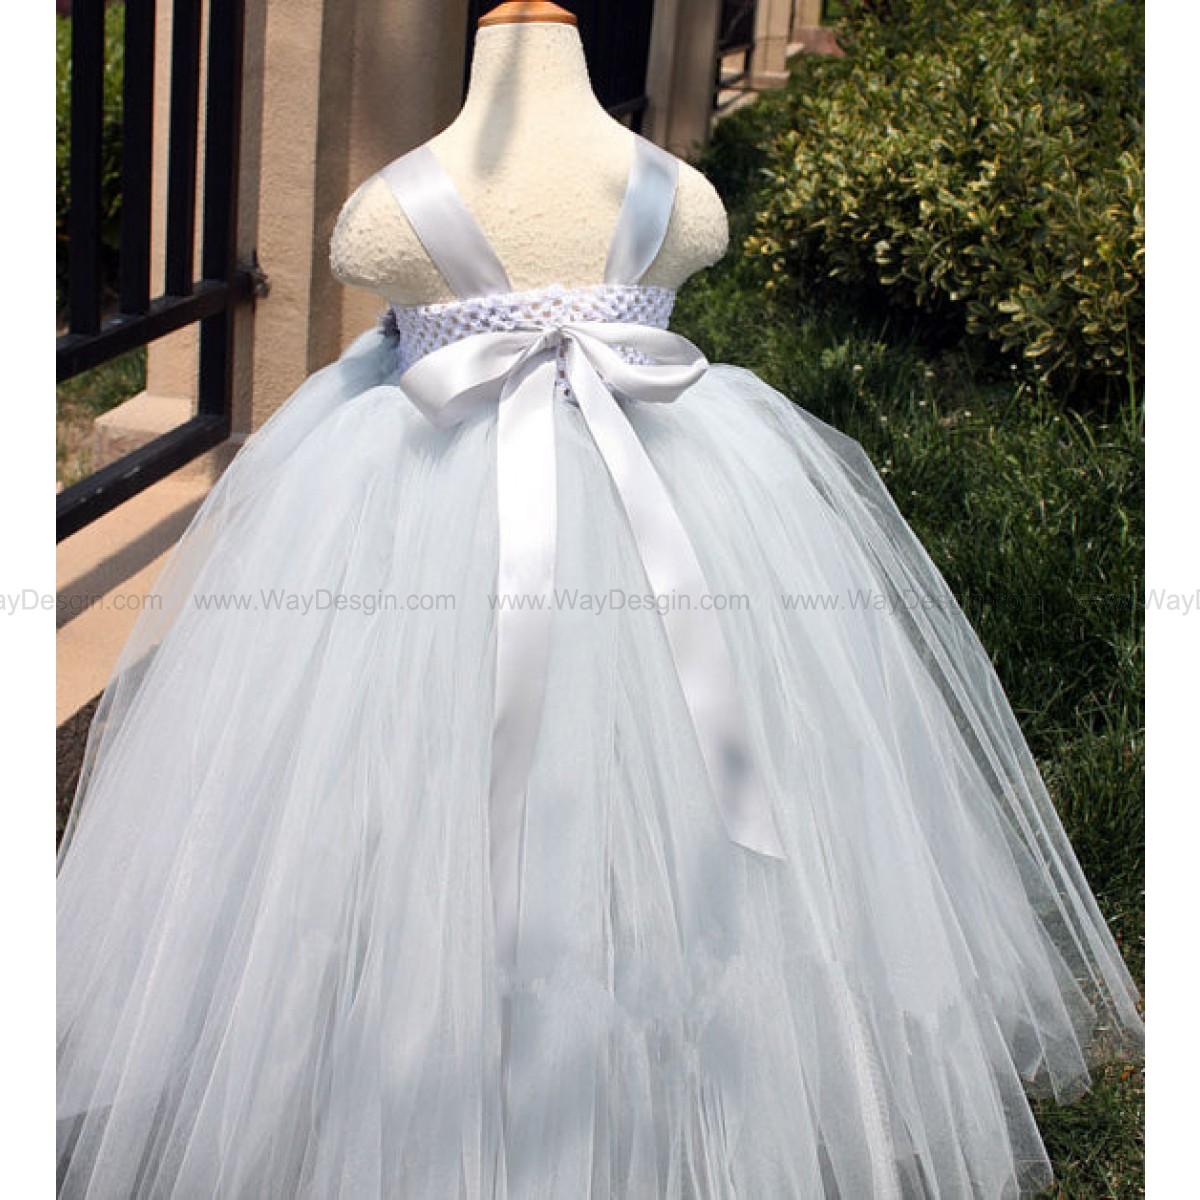 Flower girl dress grey tutu dress baby dress toddler birthday dress wedding dress newborn